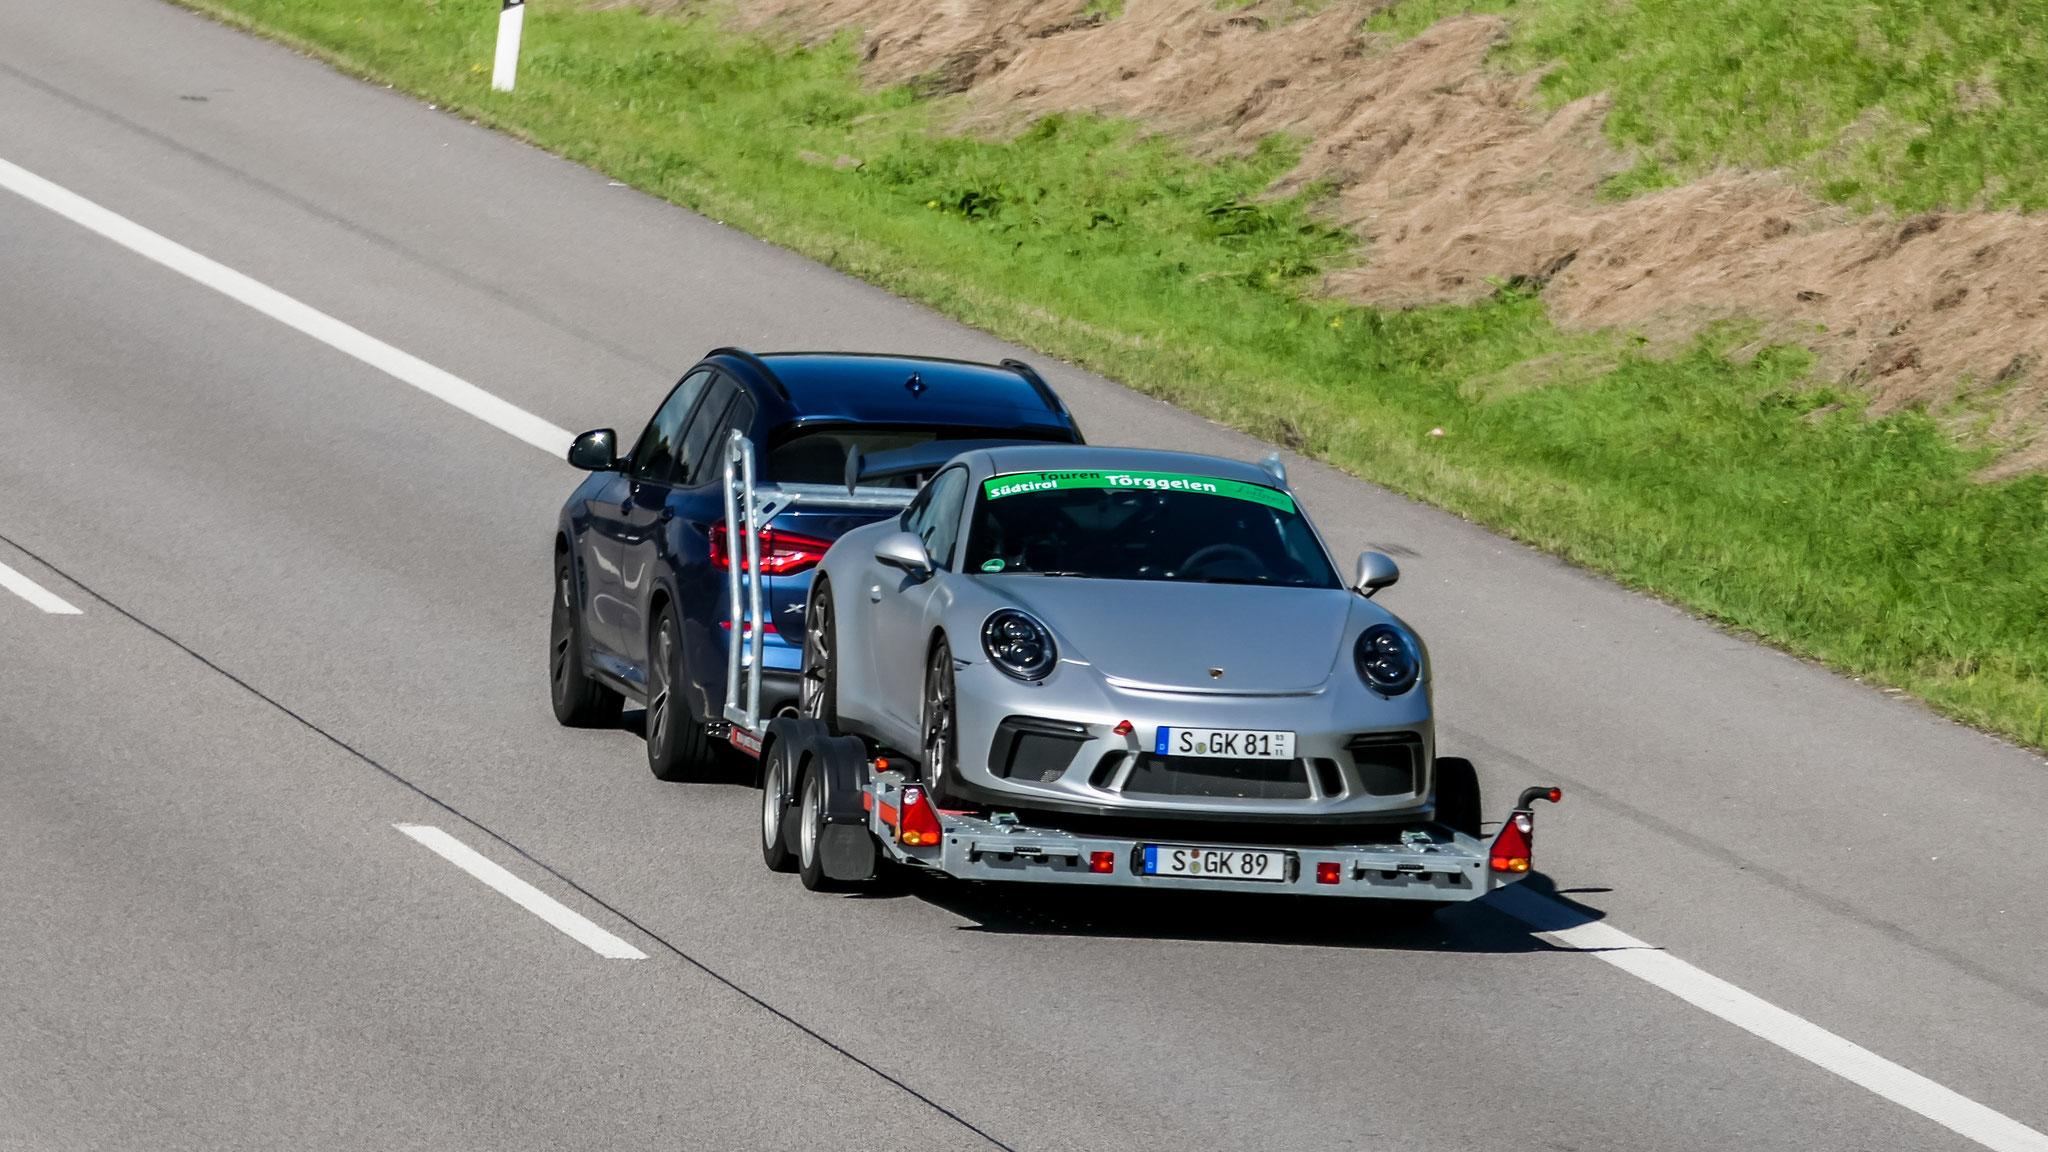 Porsche 991 GT3 - S-GK-81